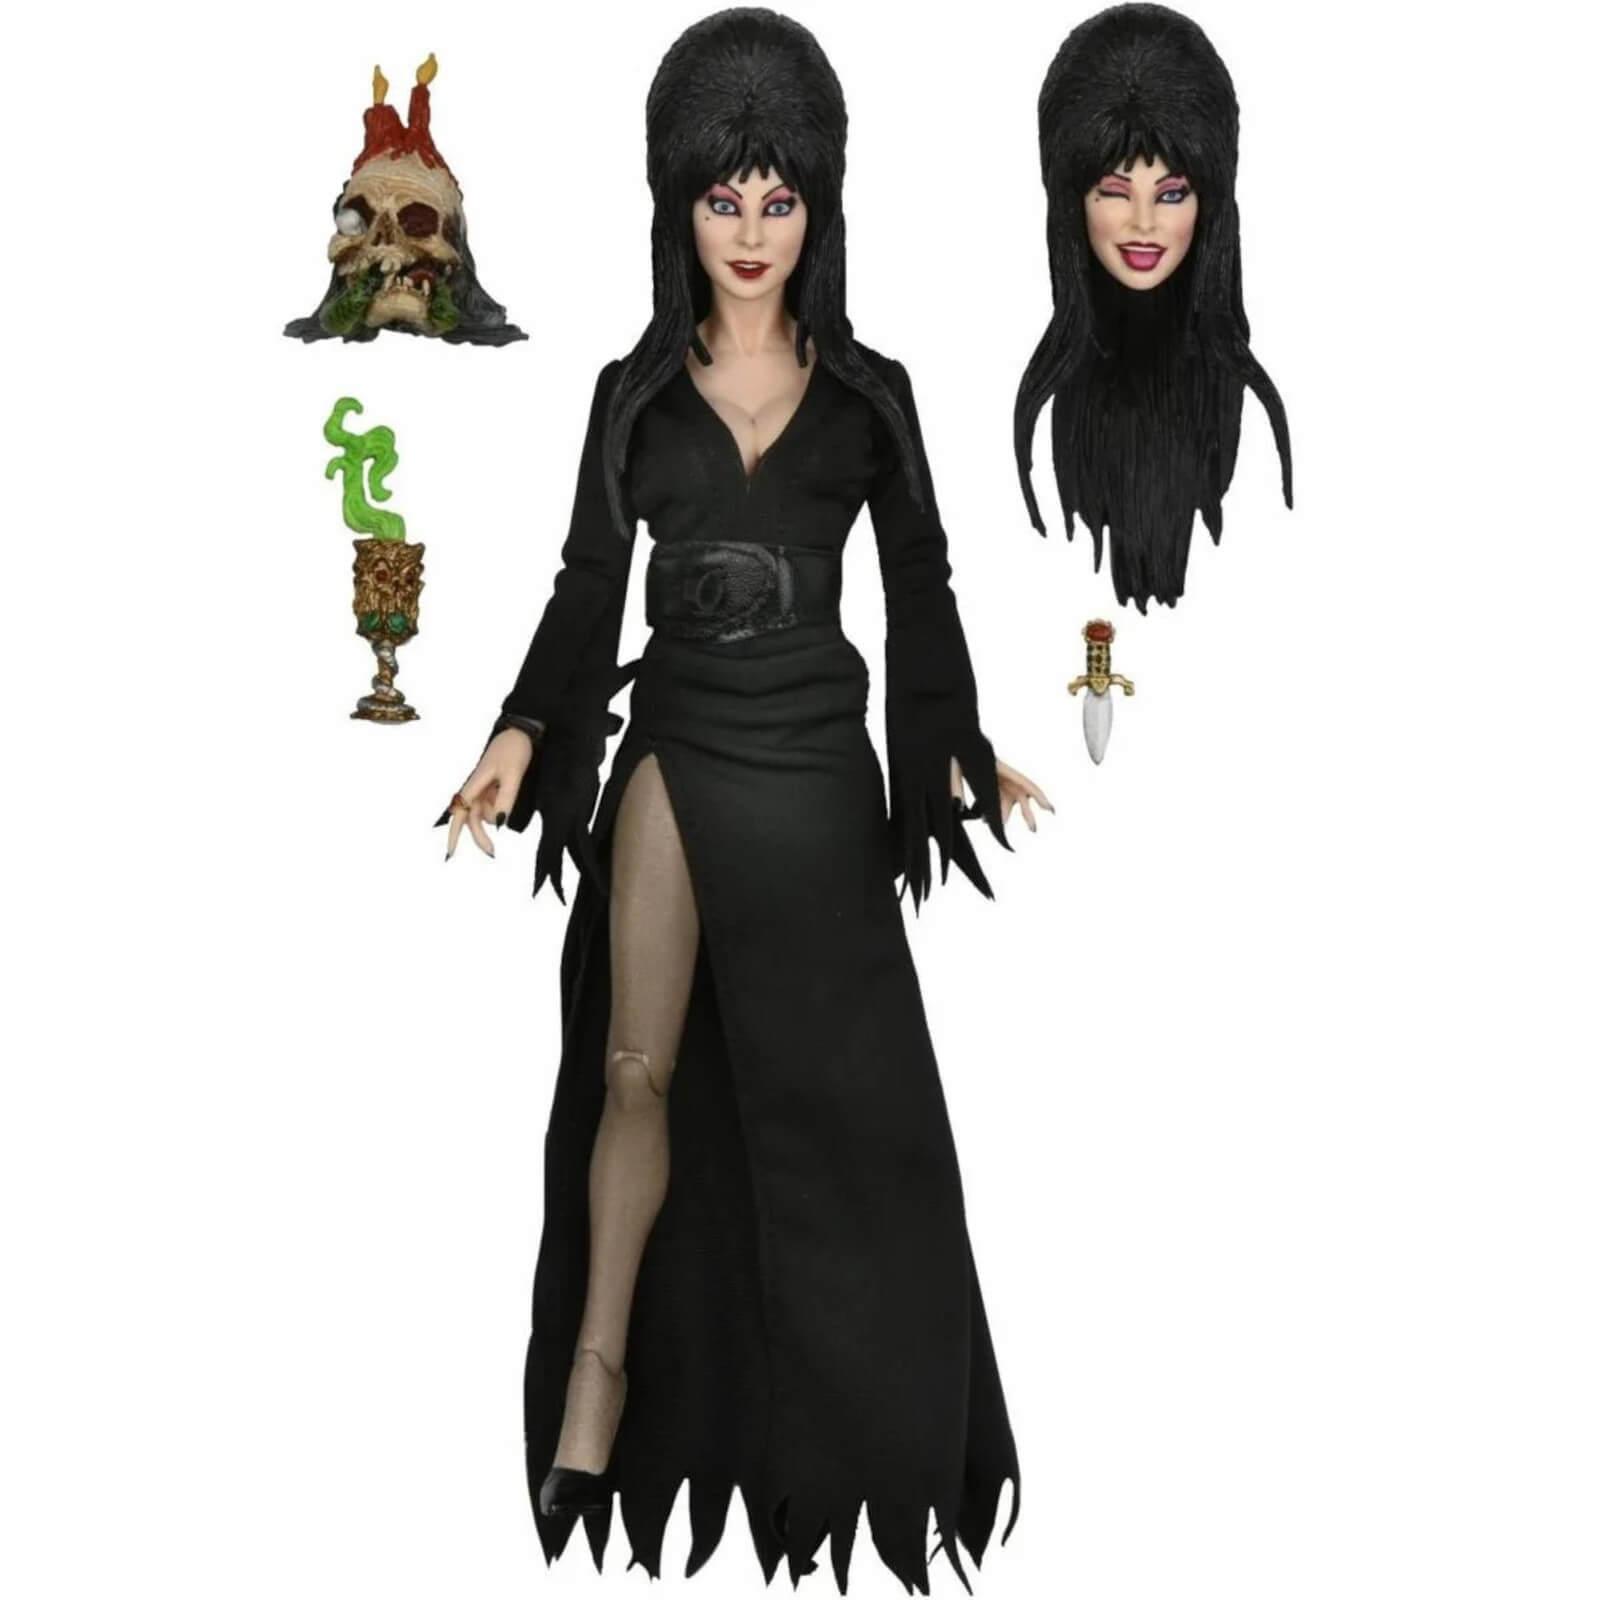 NECA Elvira Mistress of the Dark 8 Inch Action Figure